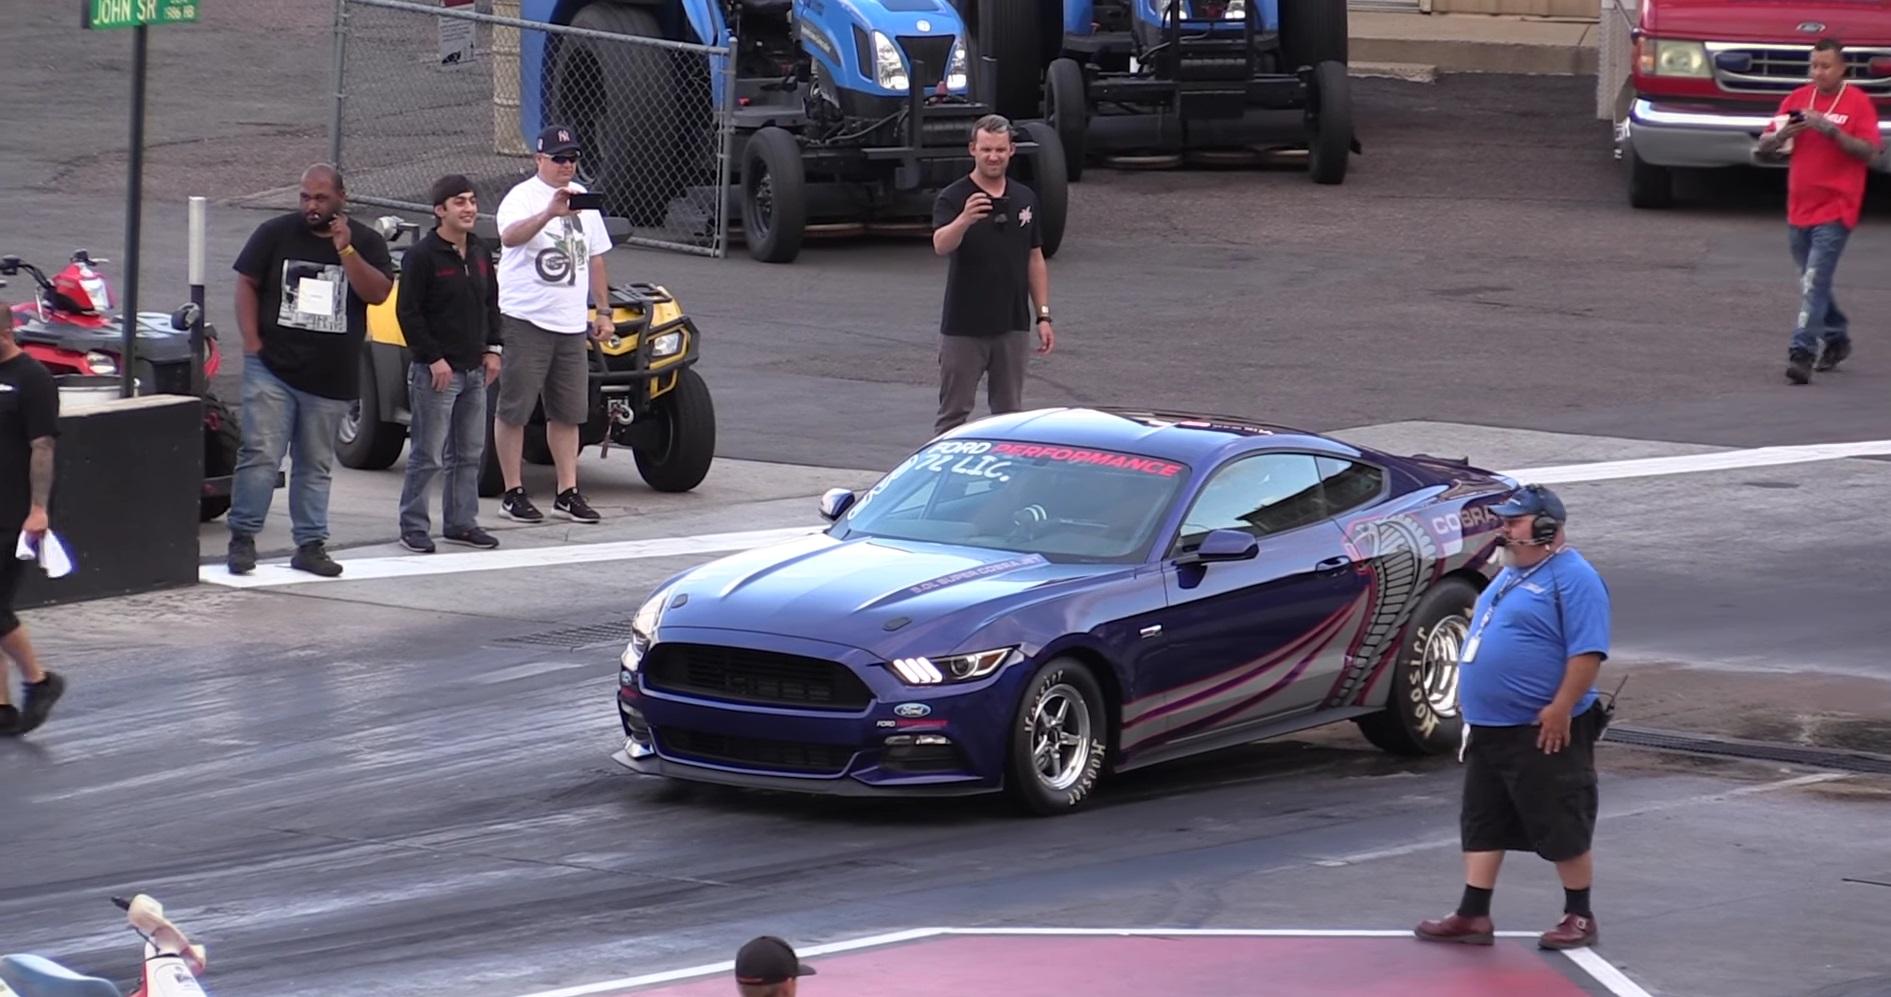 Video: 2016 Ford Mustang Cobra Jet Drag Racing at Bandimere Speedway